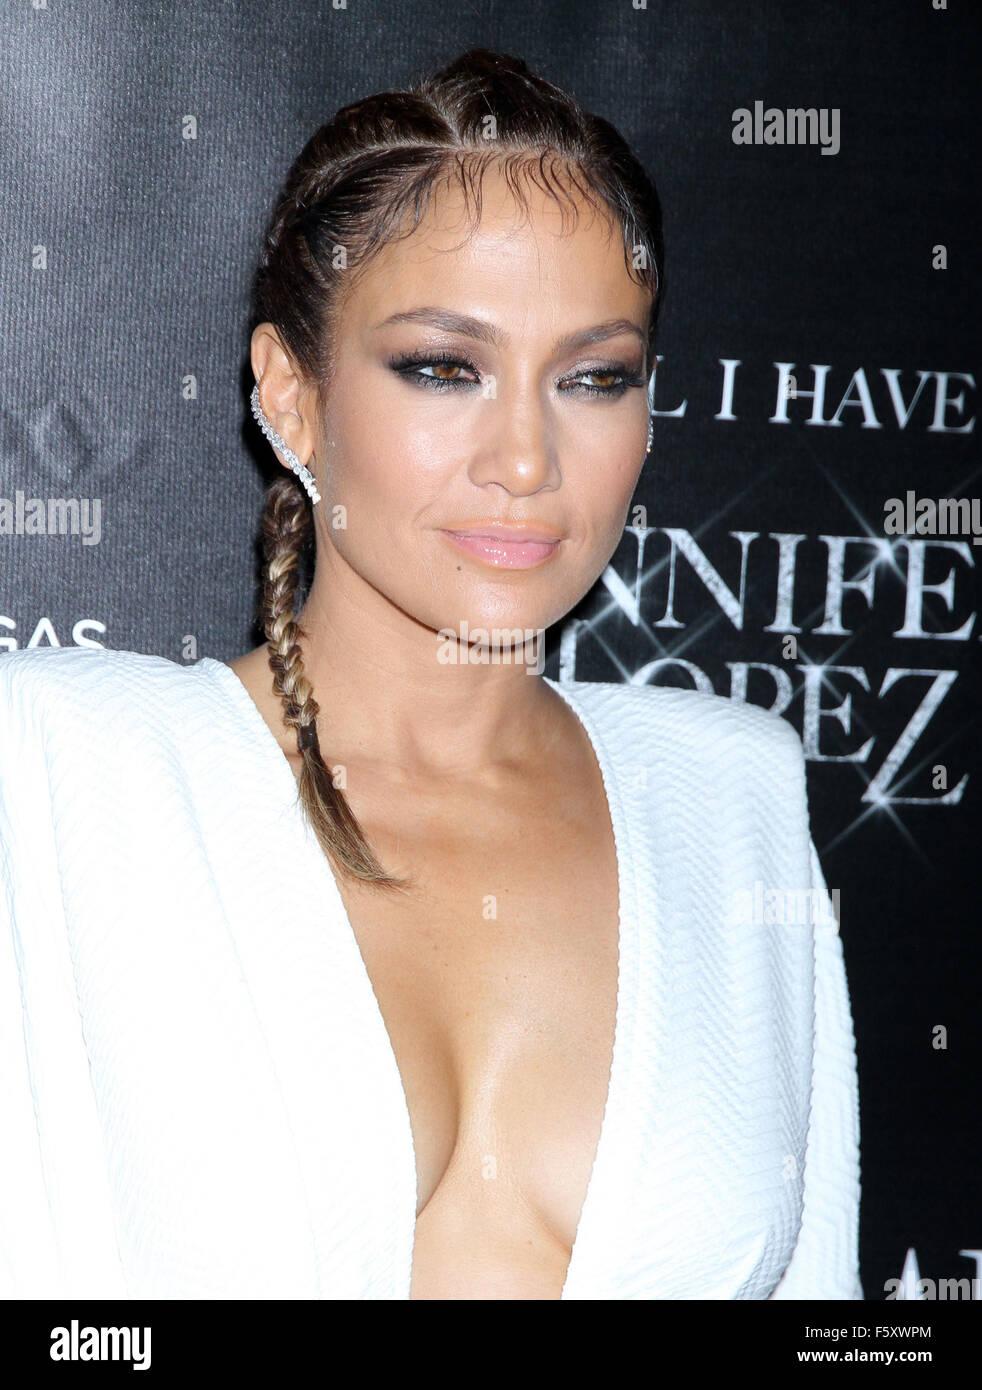 89570ee323bd Jennifer Lopez celebrates her Las Vegas residency at Chateau Nightclub    Rooftop at Paris Las Vegas Featuring  Jennifer Lopez Where  Las Vegas